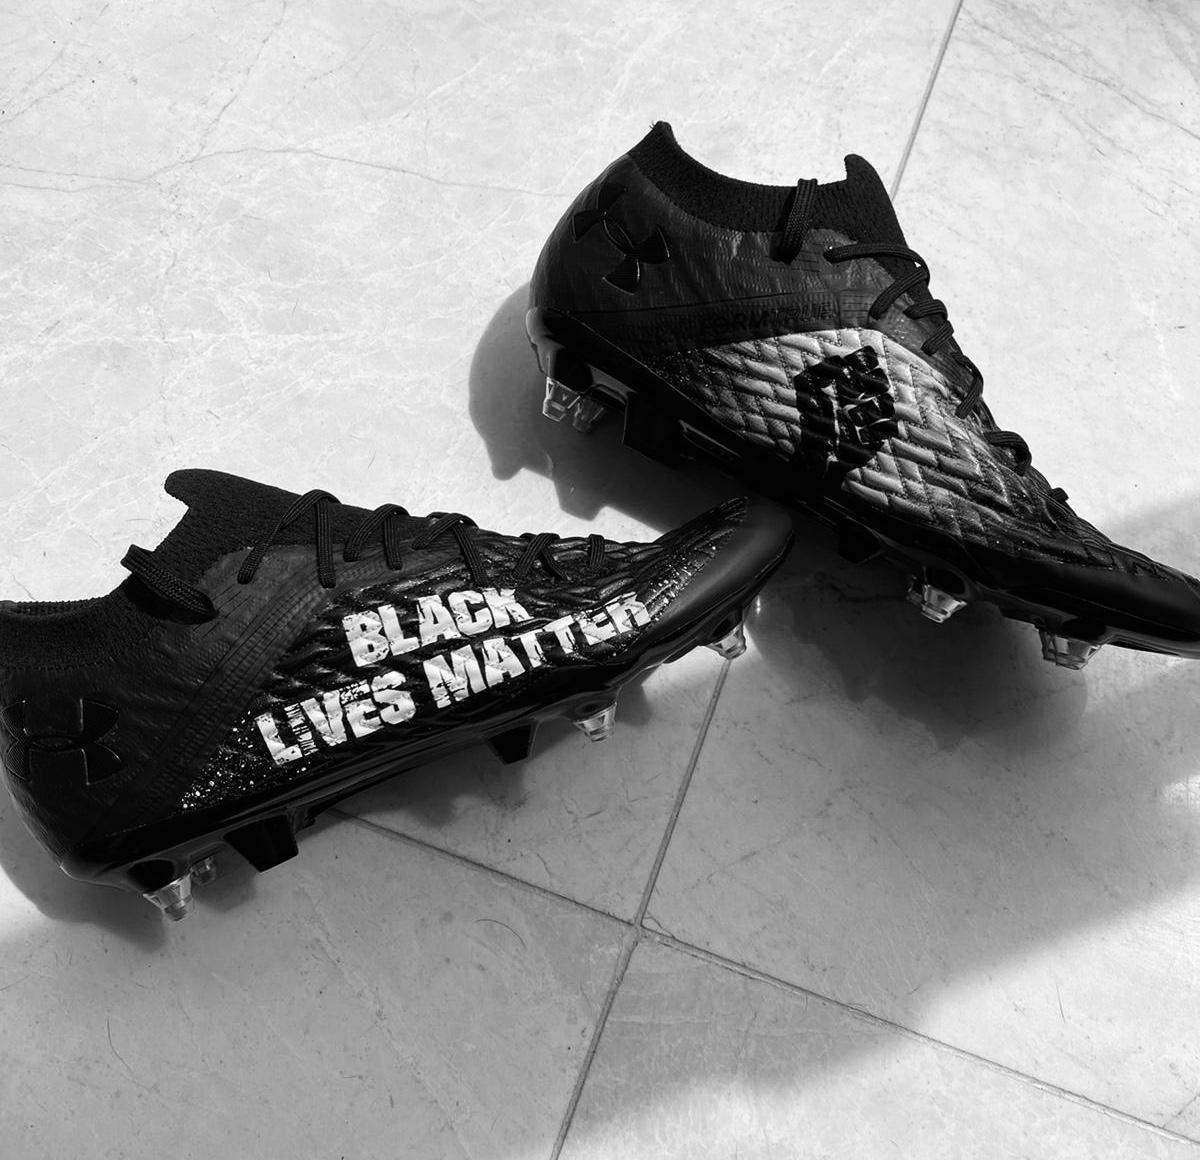 Enough is enough. It's time for change. #BlackLivesMatter https://t.co/ynEflGNKBD